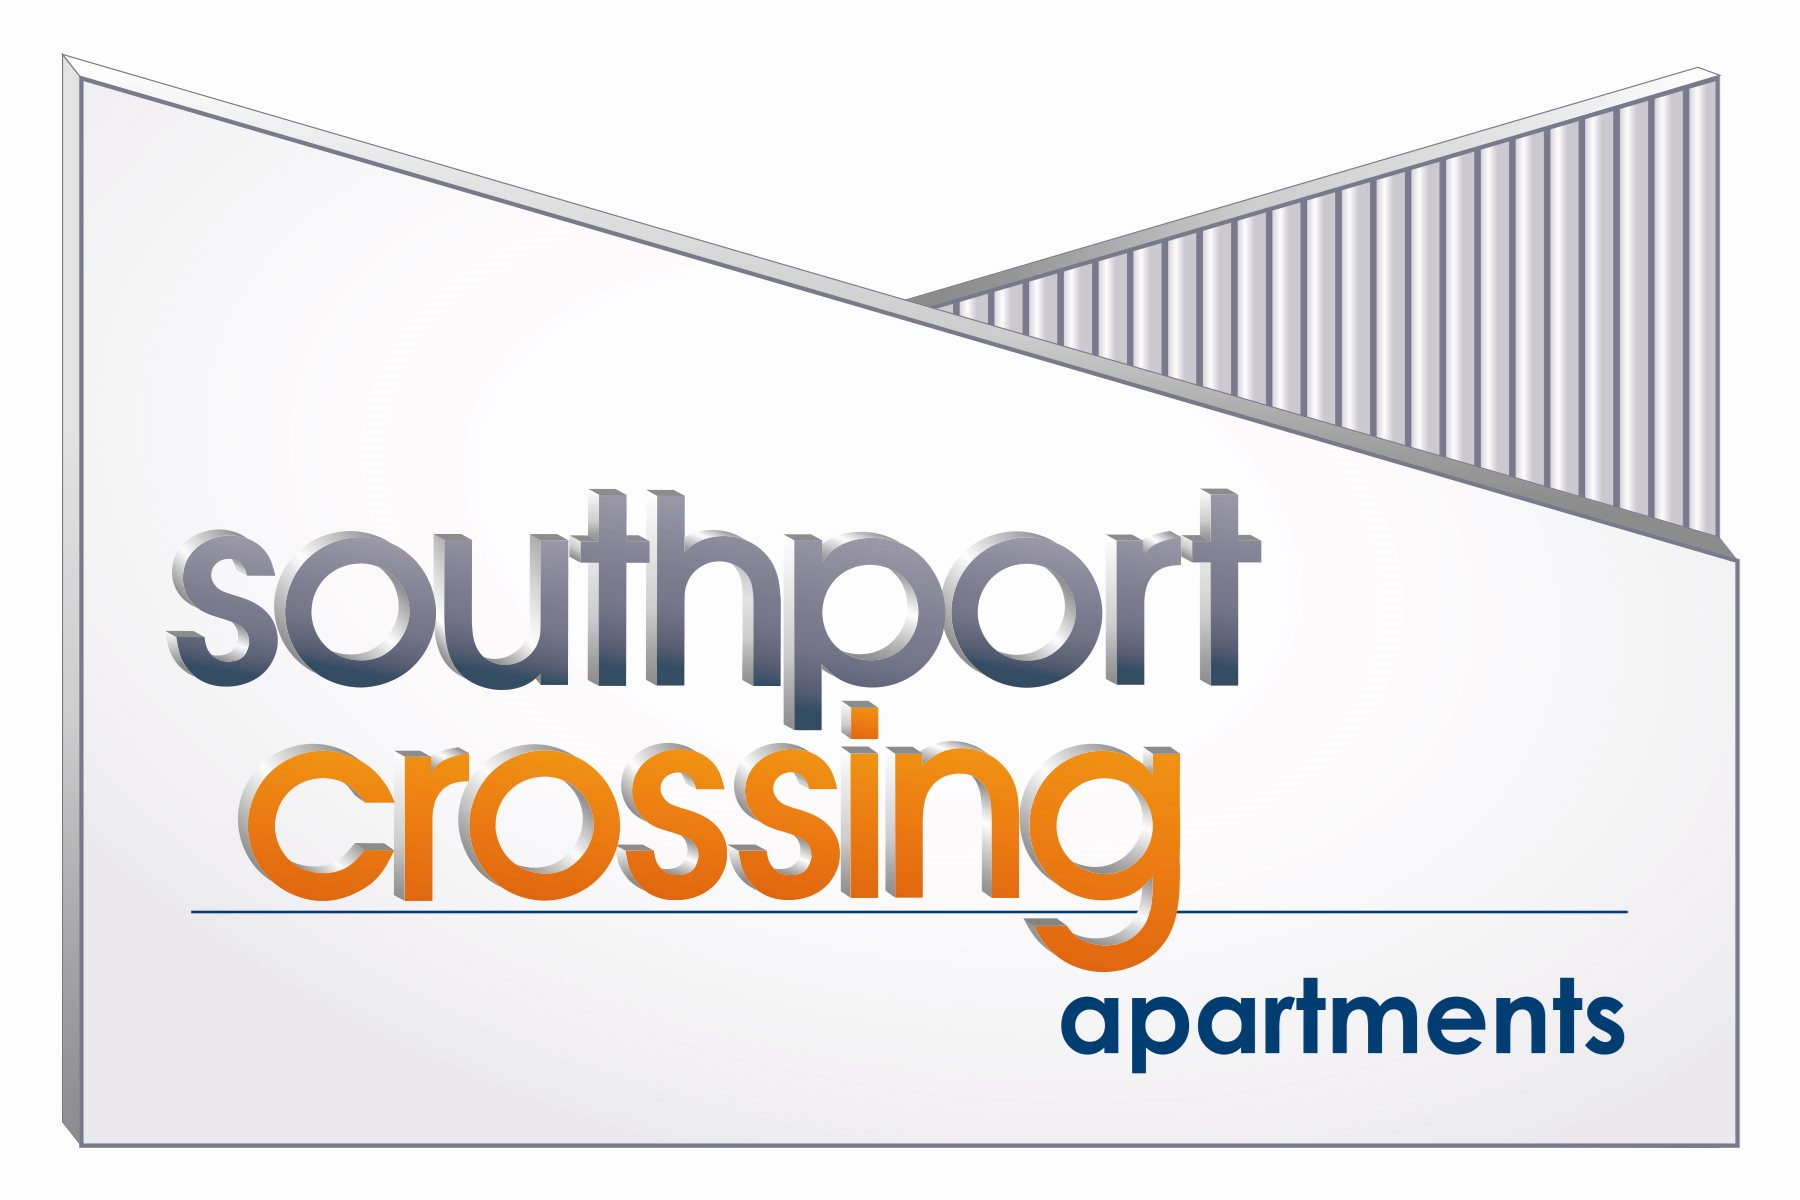 Southport Crossing Logo